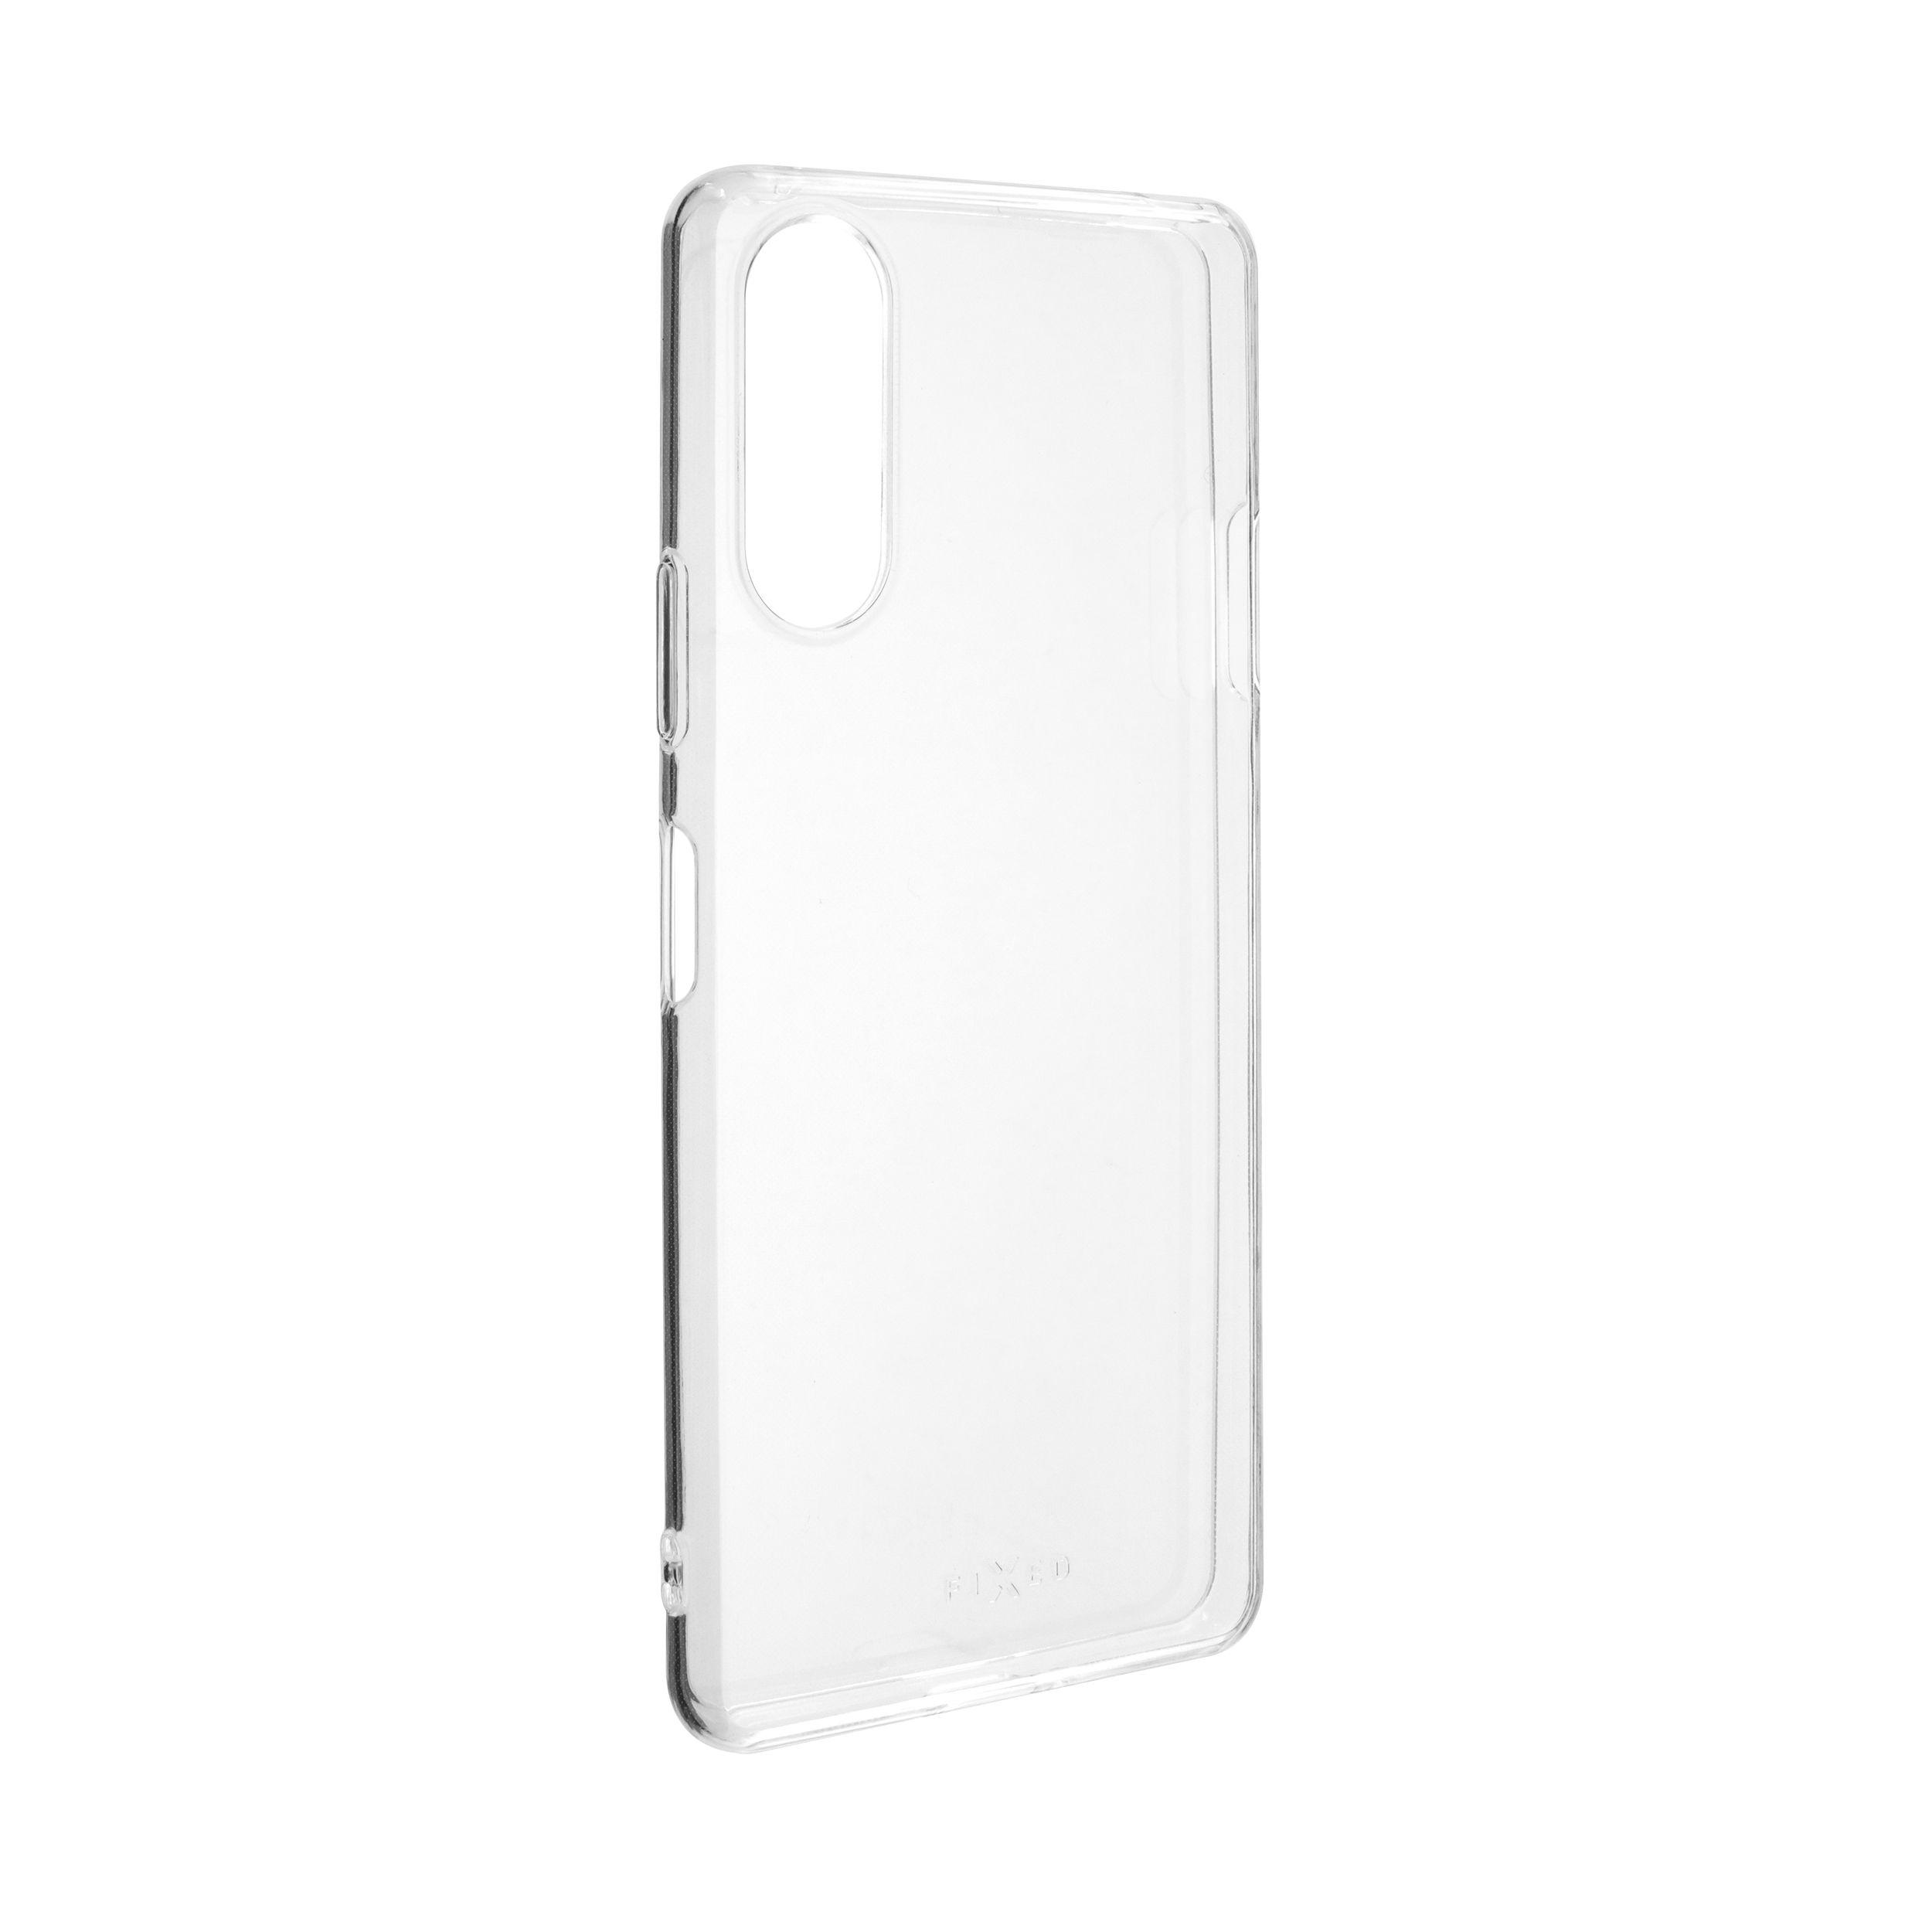 Ultratenké TPU gelové pouzdro FIXED Skin pro Sony Xperia 10 II, 0,6 mm, čiré